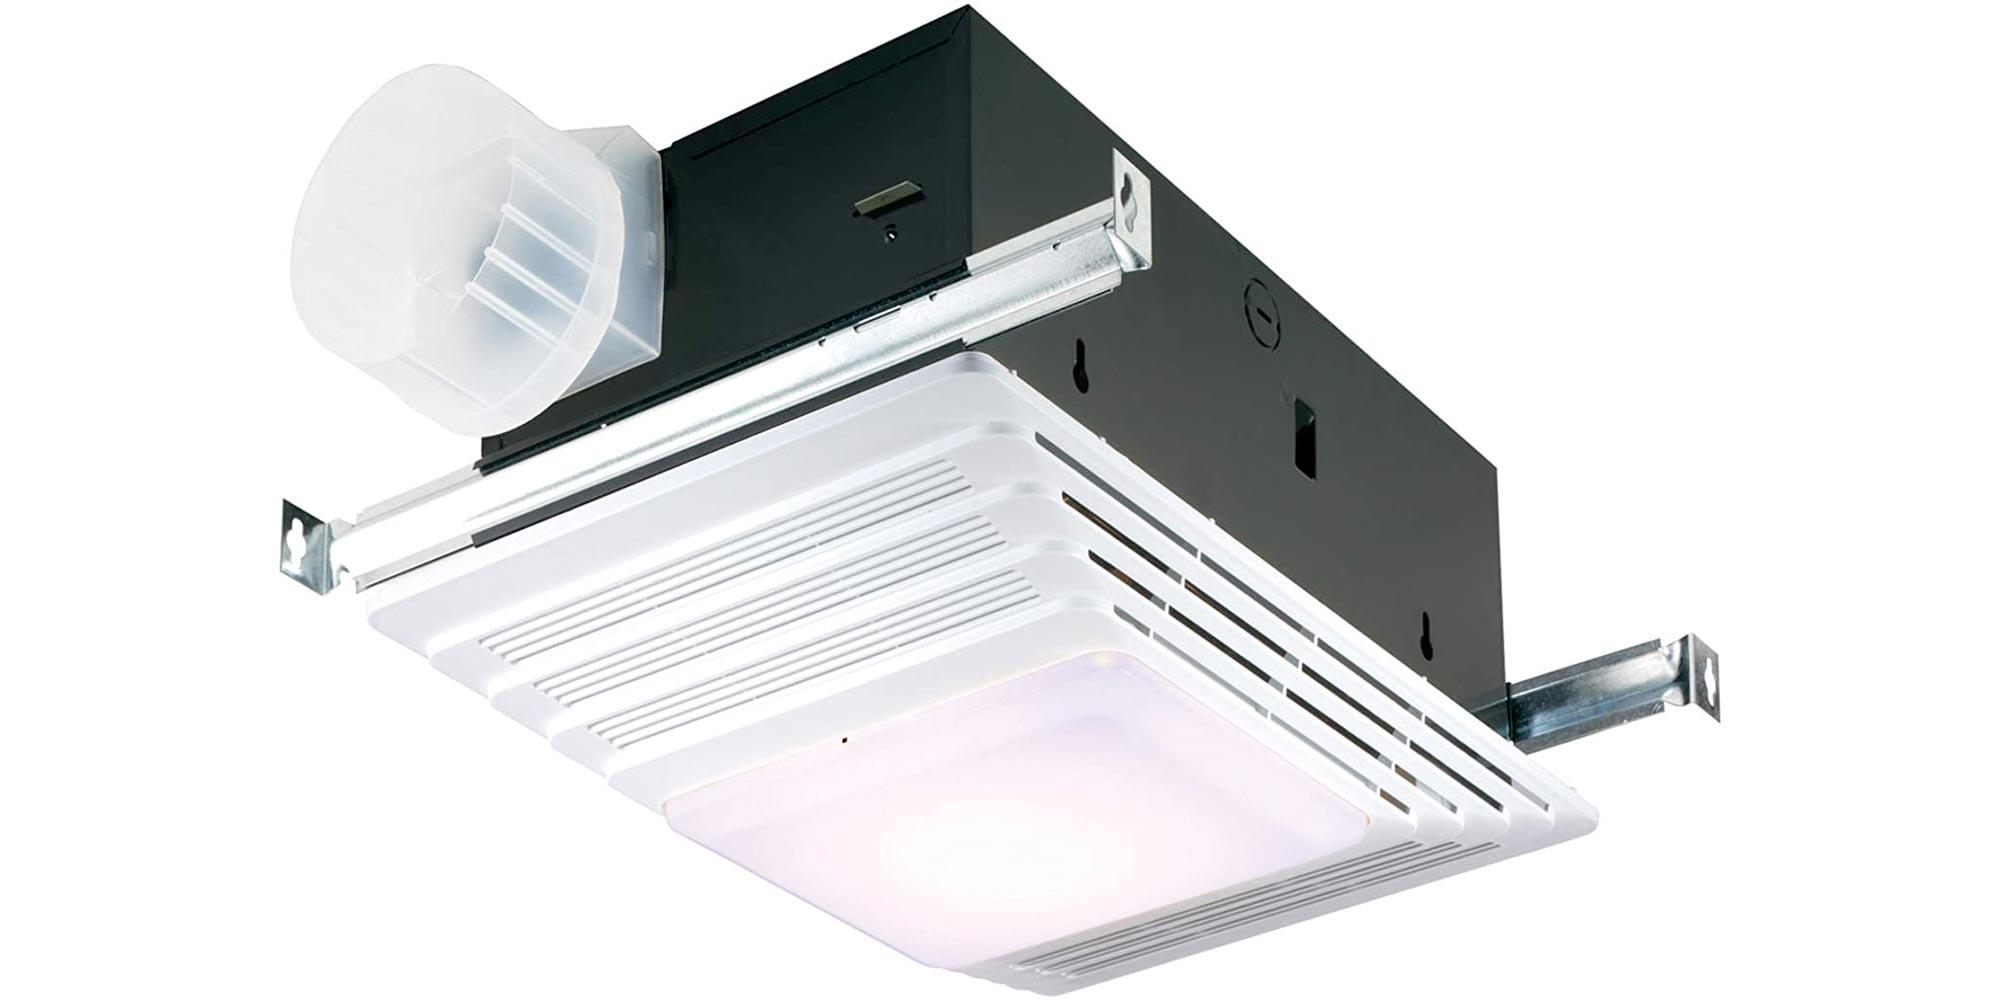 Broan Nutone S Bath Fan Also Packs A Light 1300w Heater For Under 63 Reg 109 9to5toys